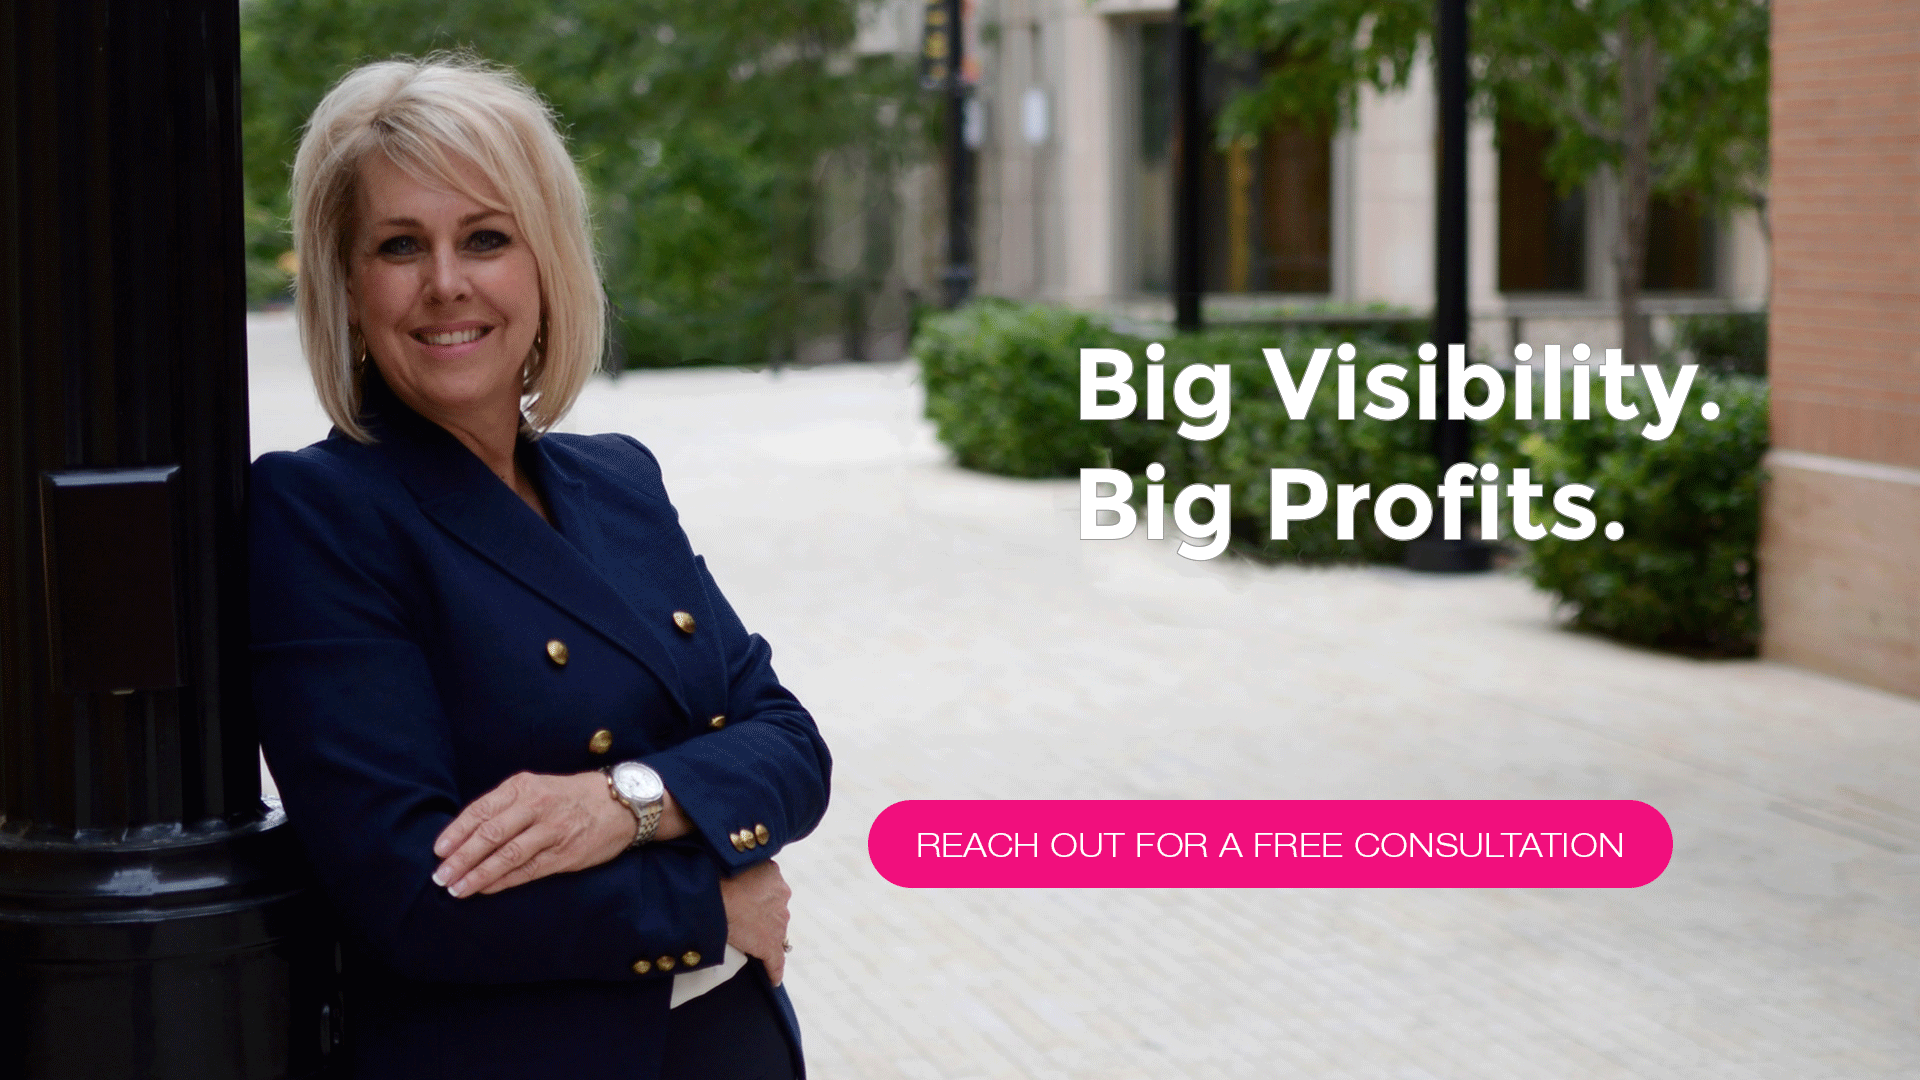 Diane Lefrandt | Big Visibility. Big Profits. | Reach Out for a Free Consultation